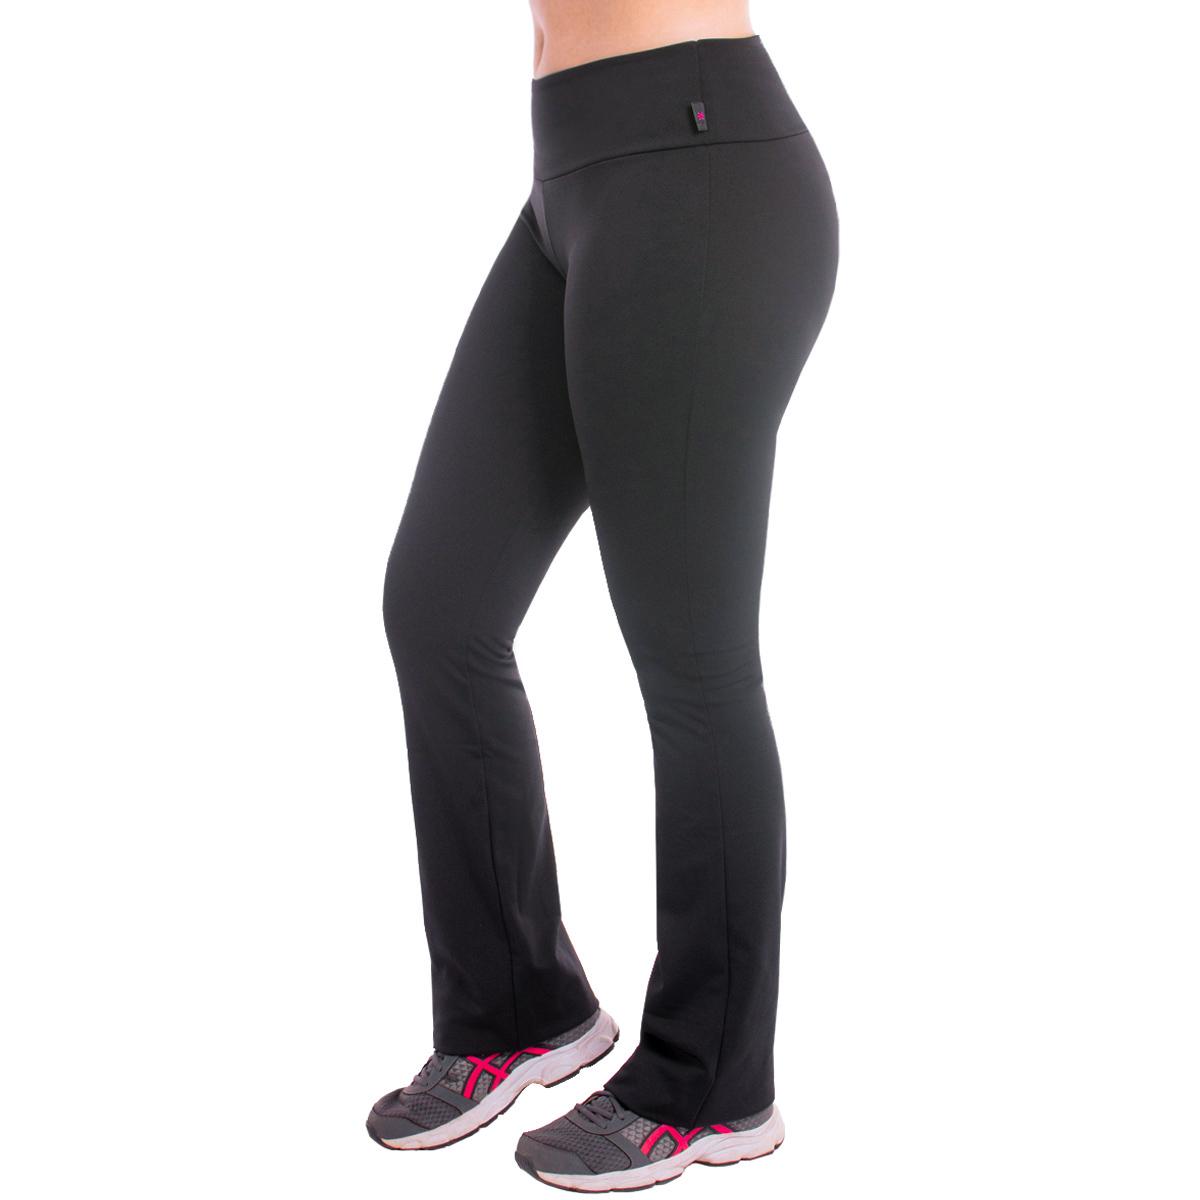 Kit com 5 Calças Legging Feminina Bailarina Peluciada Flare